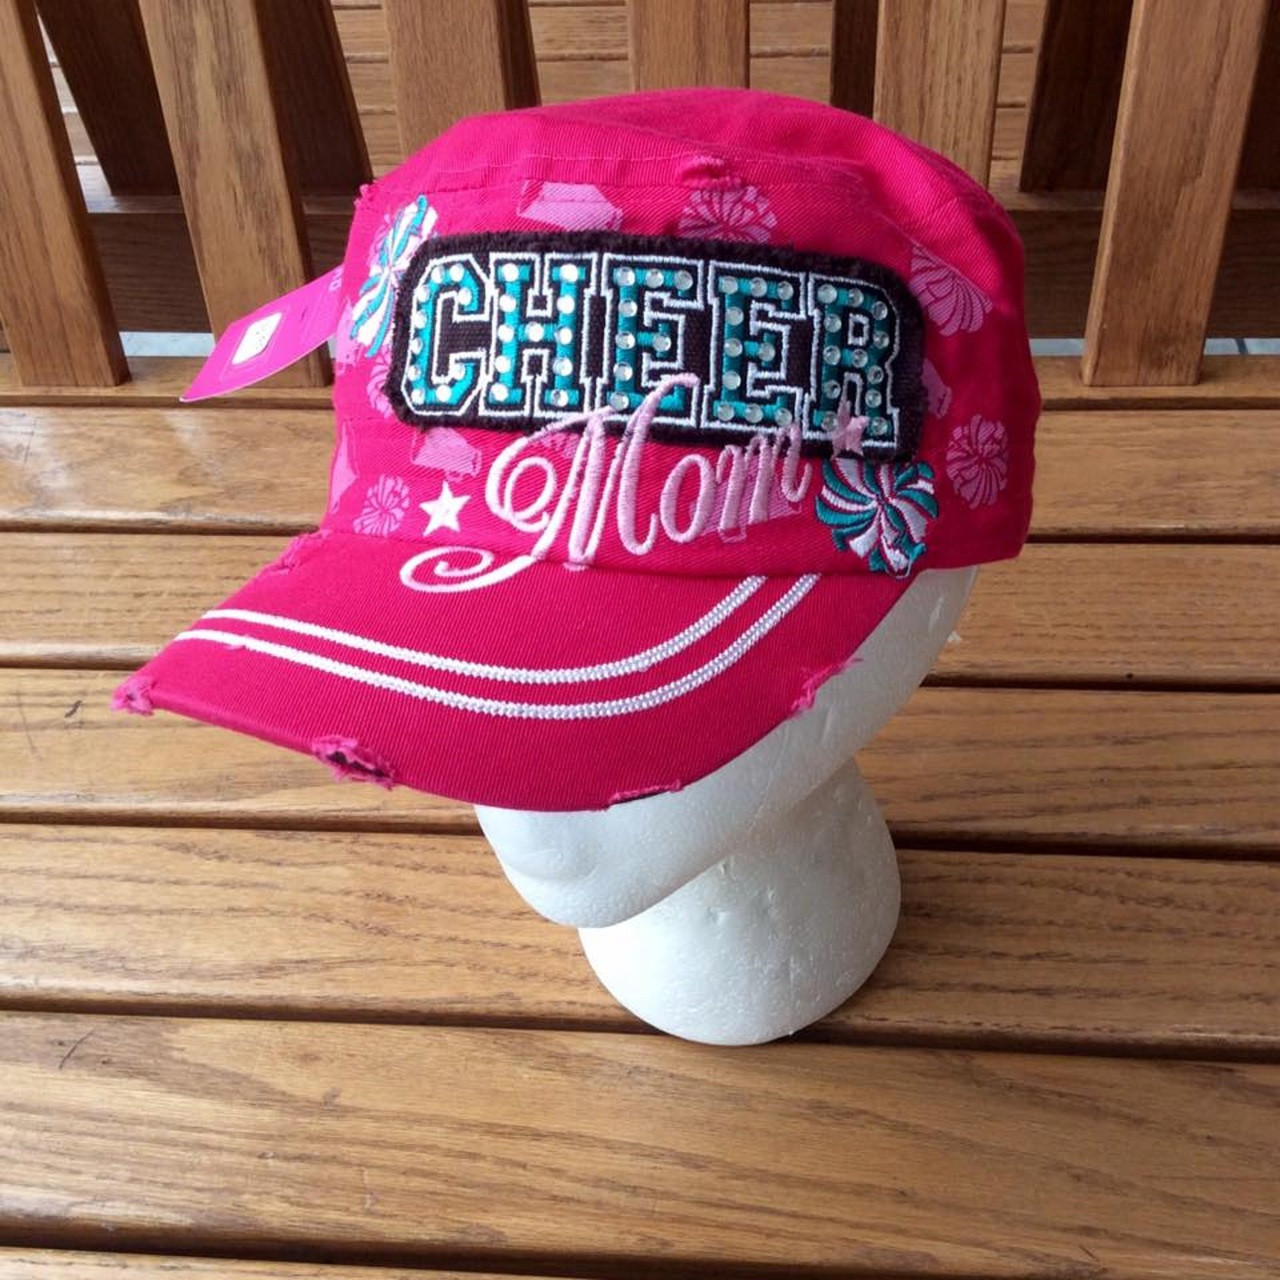 98261b2e870489 Women's Pink Turquoise Cheer Mom Baseball Cap, Women's Baseball Cap, Cheer  Mom Hat,